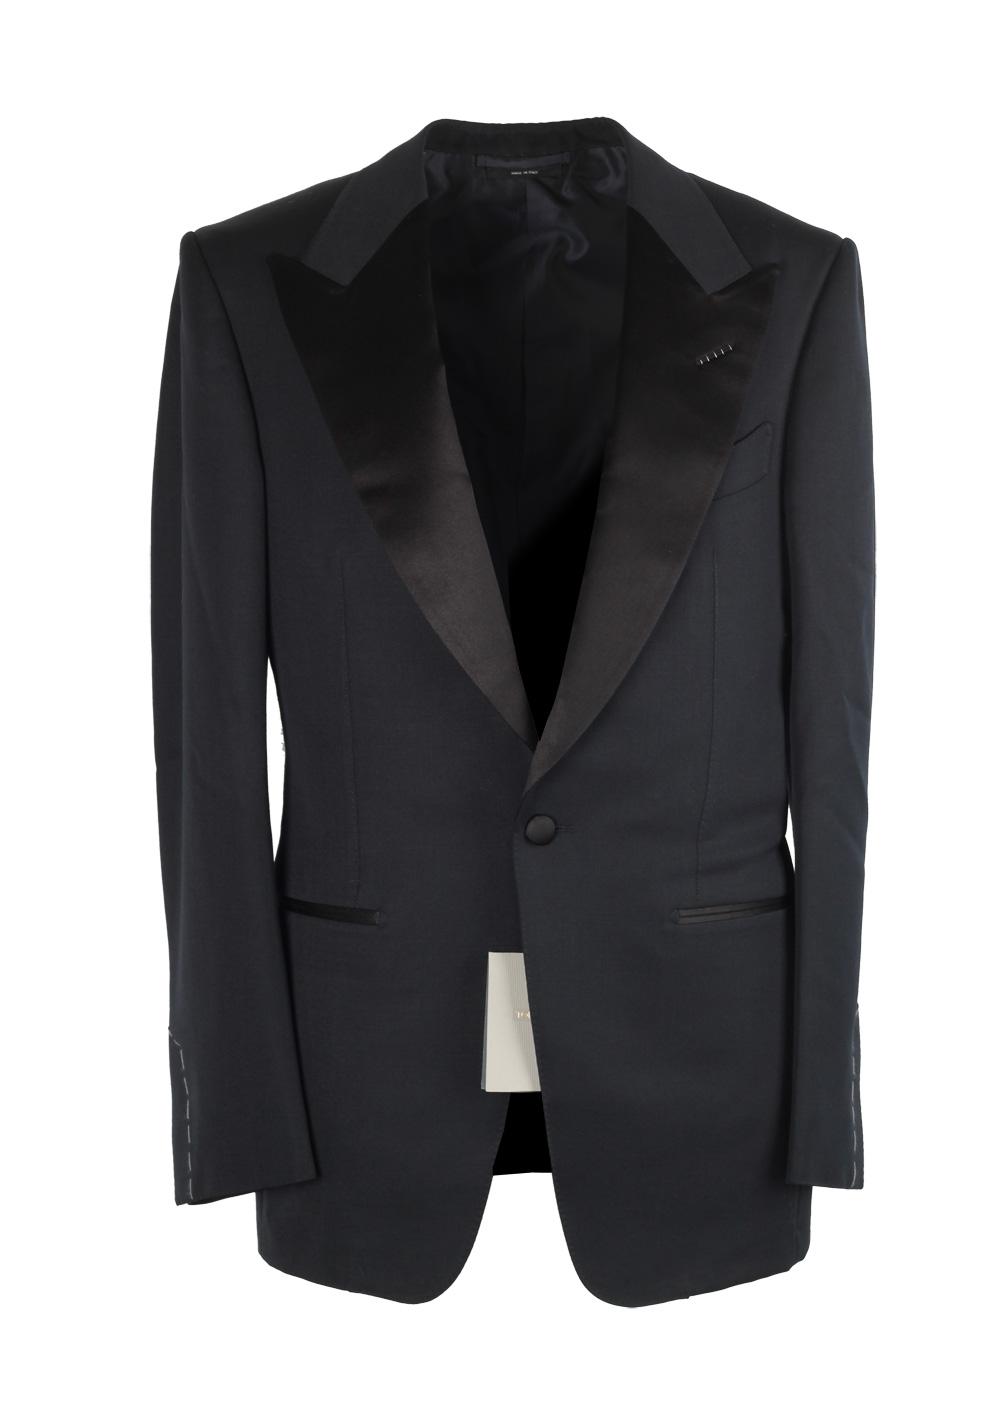 TOM FORD Windsor Black Tuxedo Smoking Suit Size 46 / 36R U.S. Fit A | Costume Limité